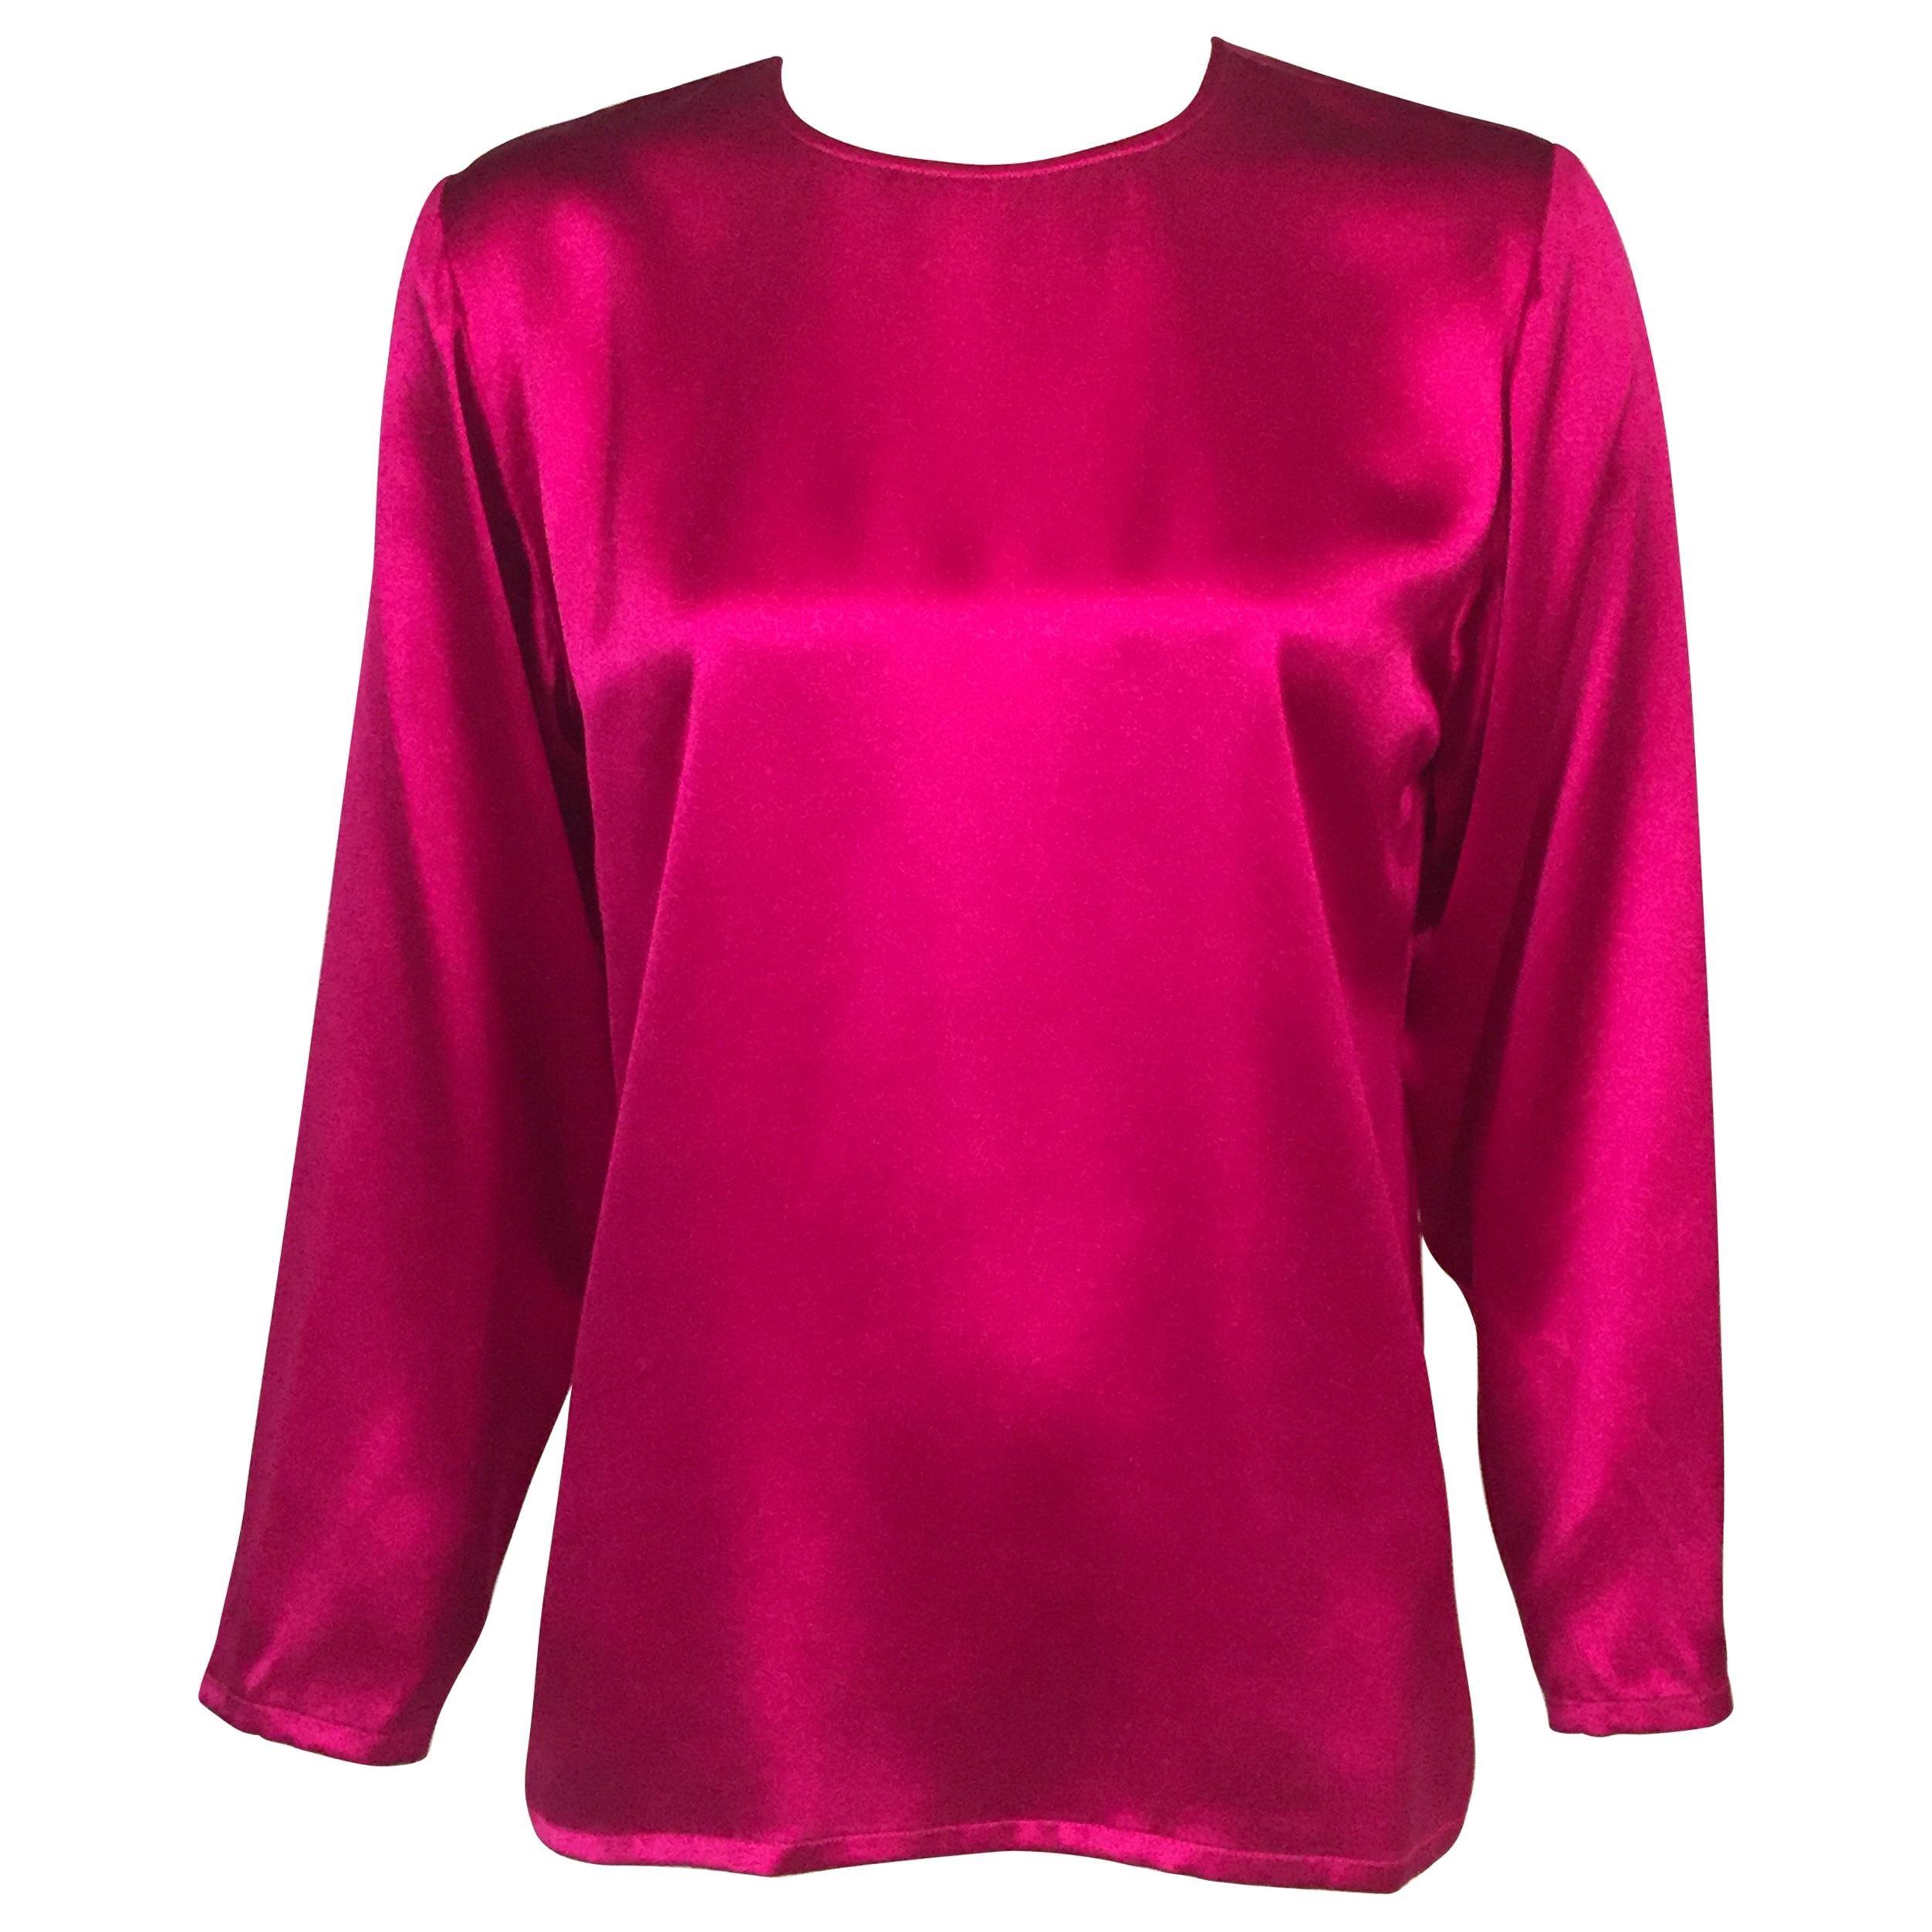 Yves Saint Laurent Cyclamen Pink Silk Charmeuse Blouse